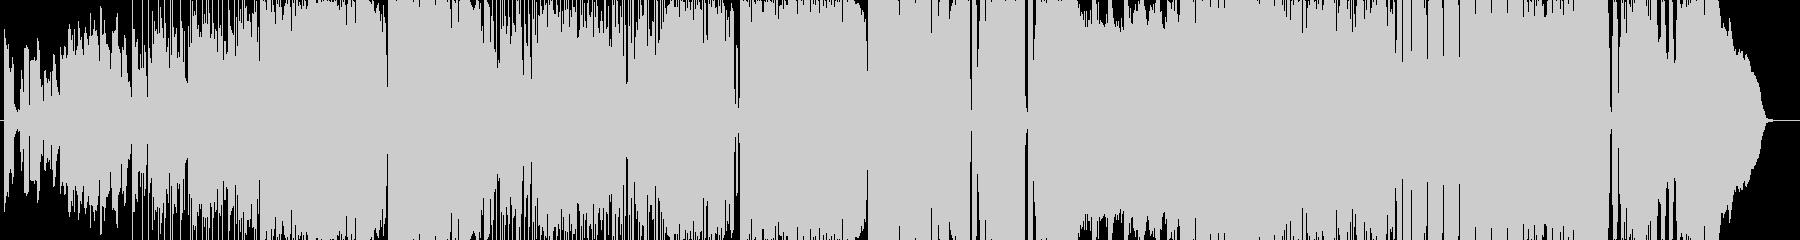 DUGHNUTSの未再生の波形